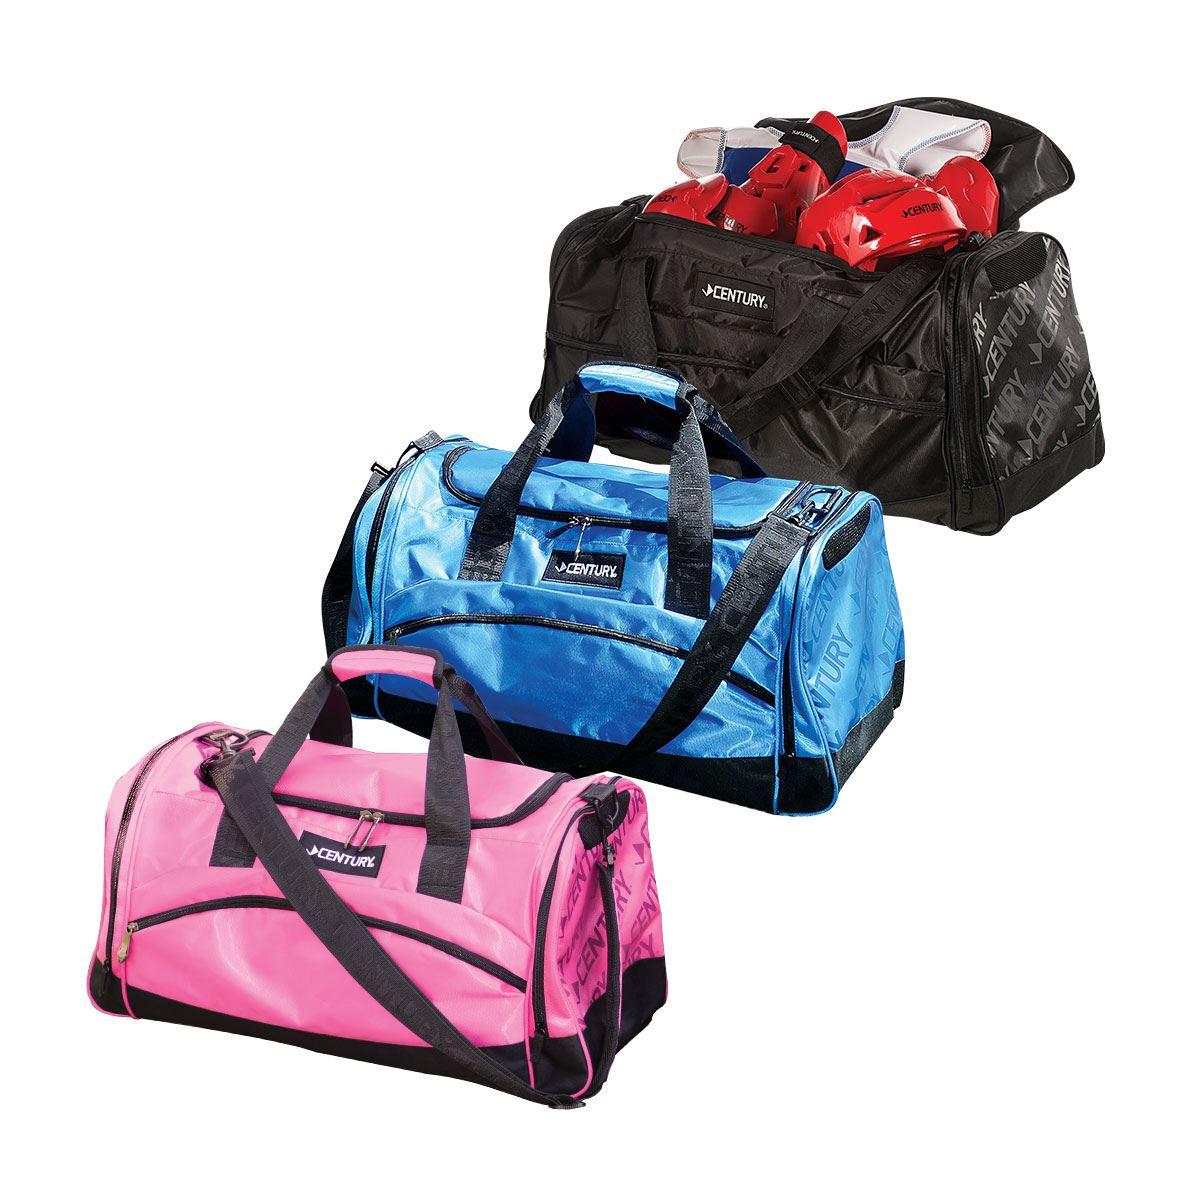 9d57aa31d9 Premium Gear Bags Medium Size